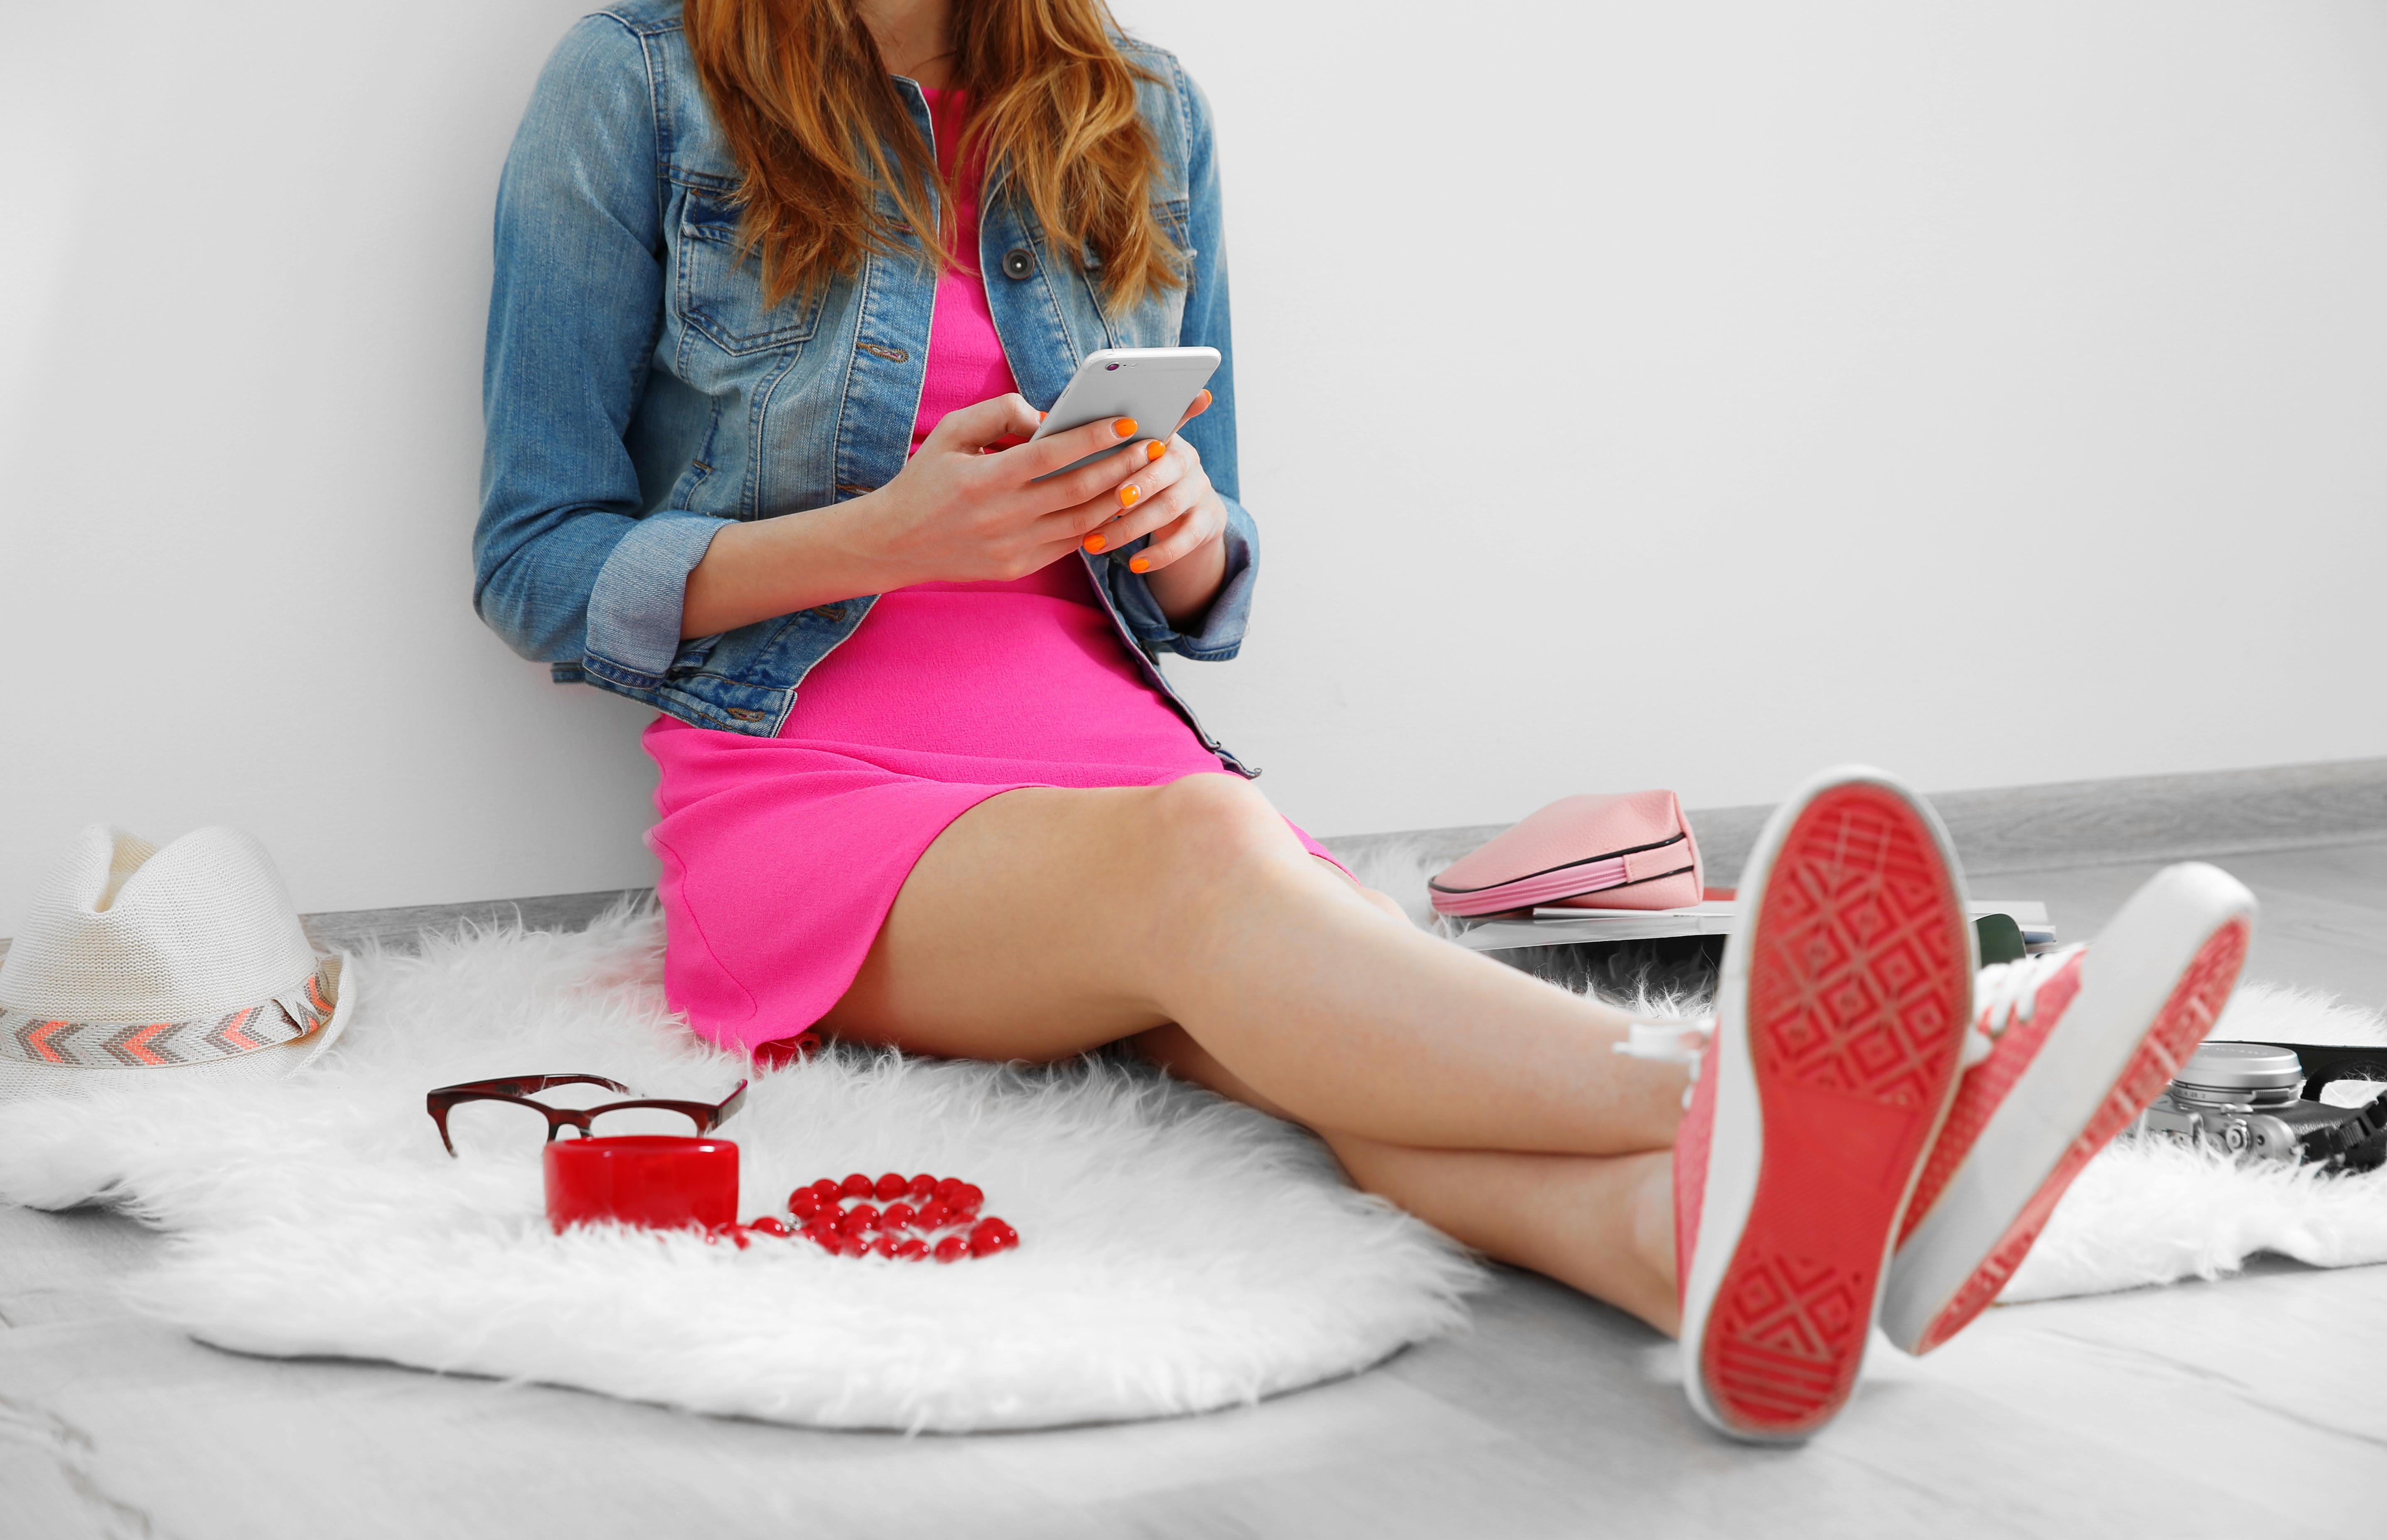 Fashion blogger on phone